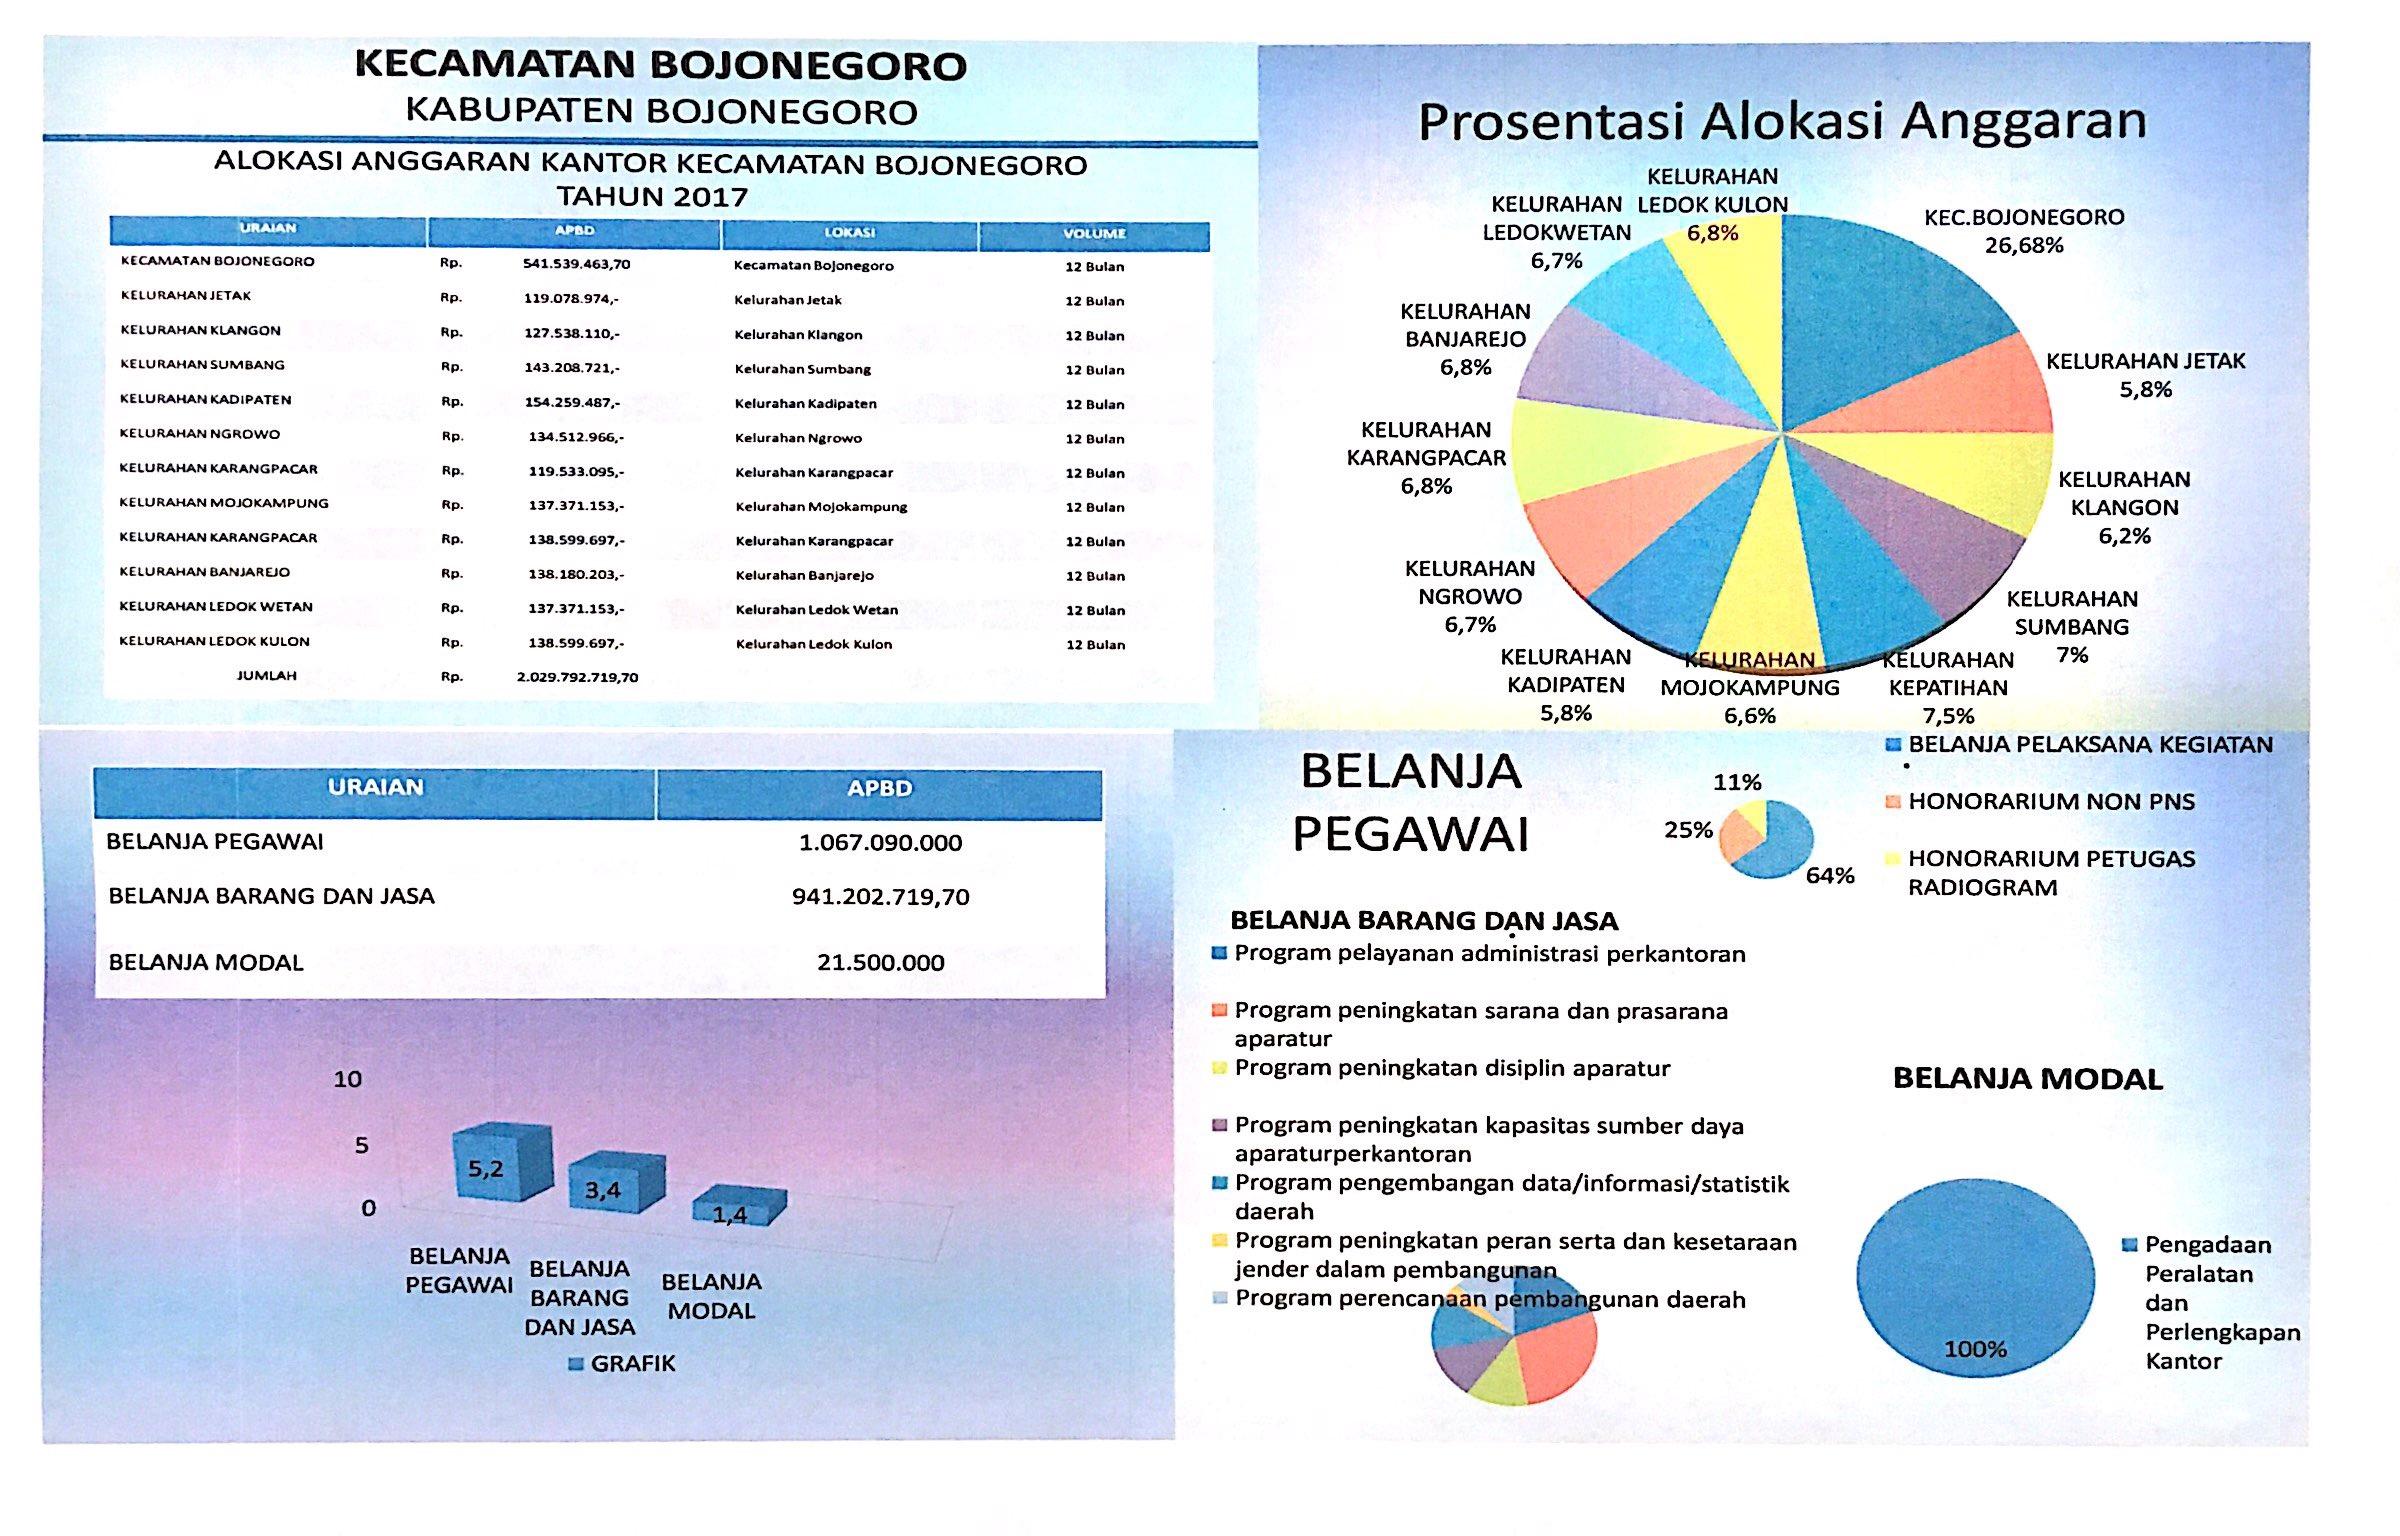 Alokasi Anggaran<BR>Kantor Kecamatan Bojonegoro Tahun 2017